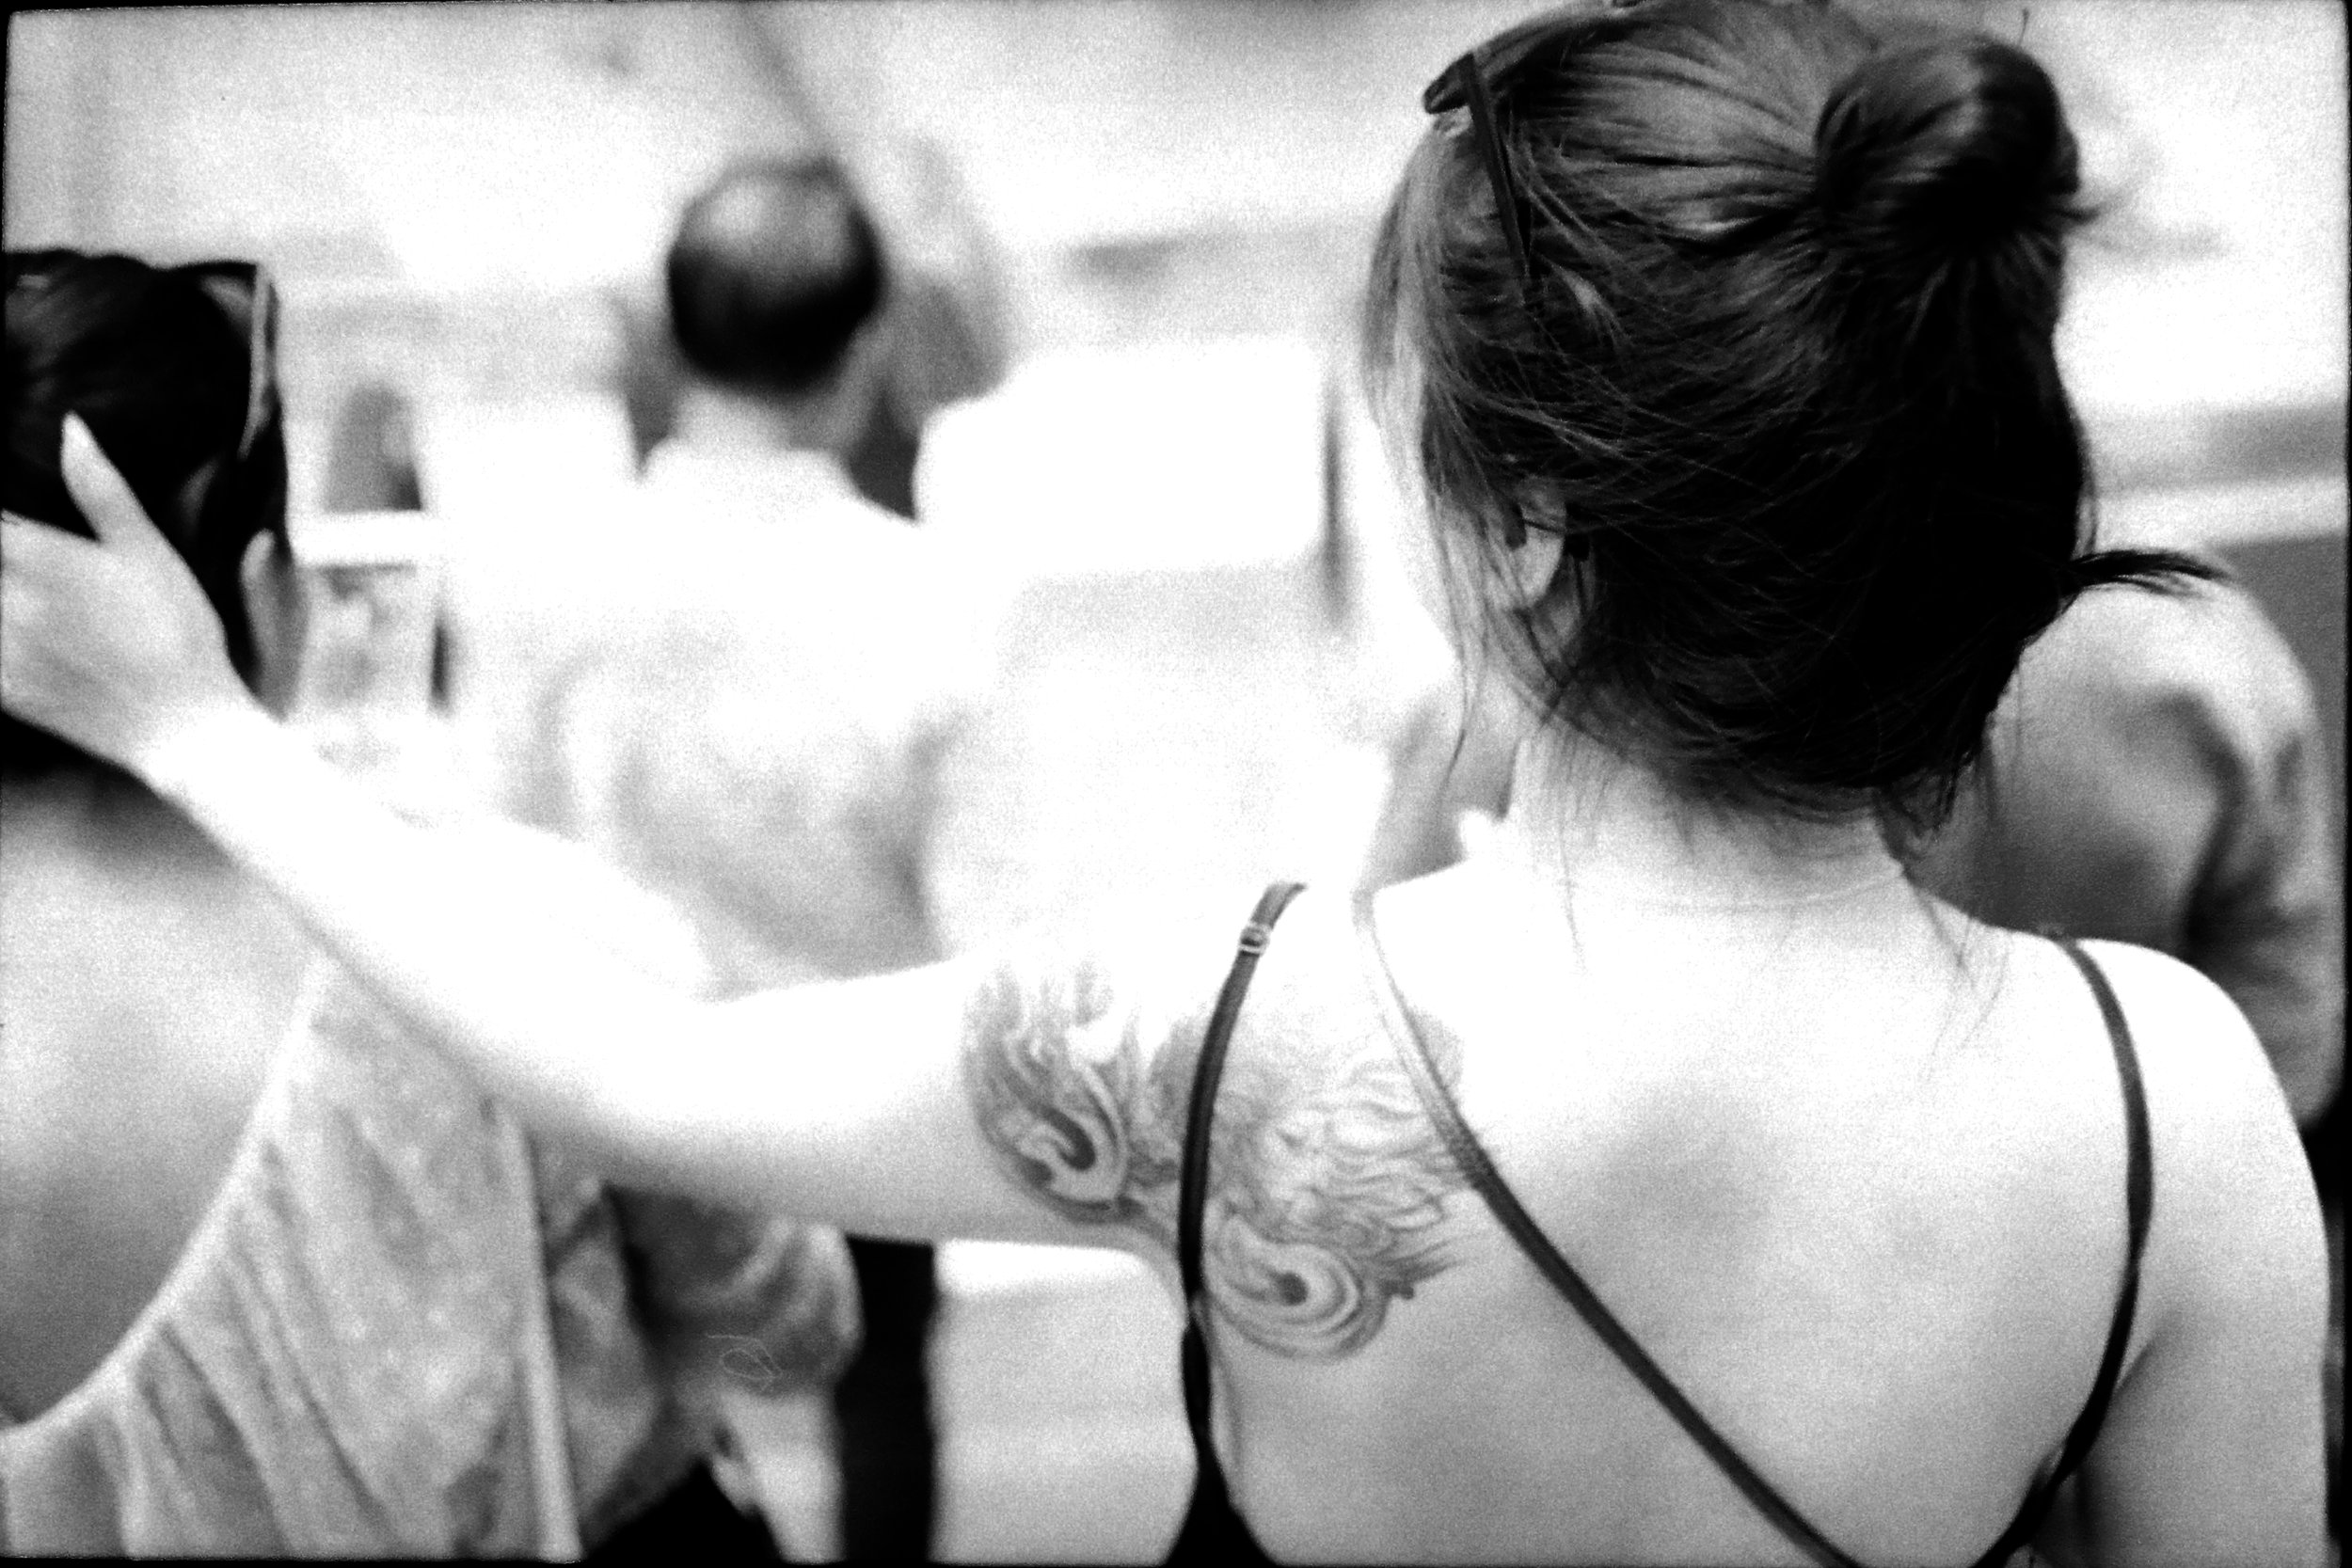 chromacomaphoto street photography bangkok thailand film tri x summicron rigid 50 leica m4 black and white (4).JPG